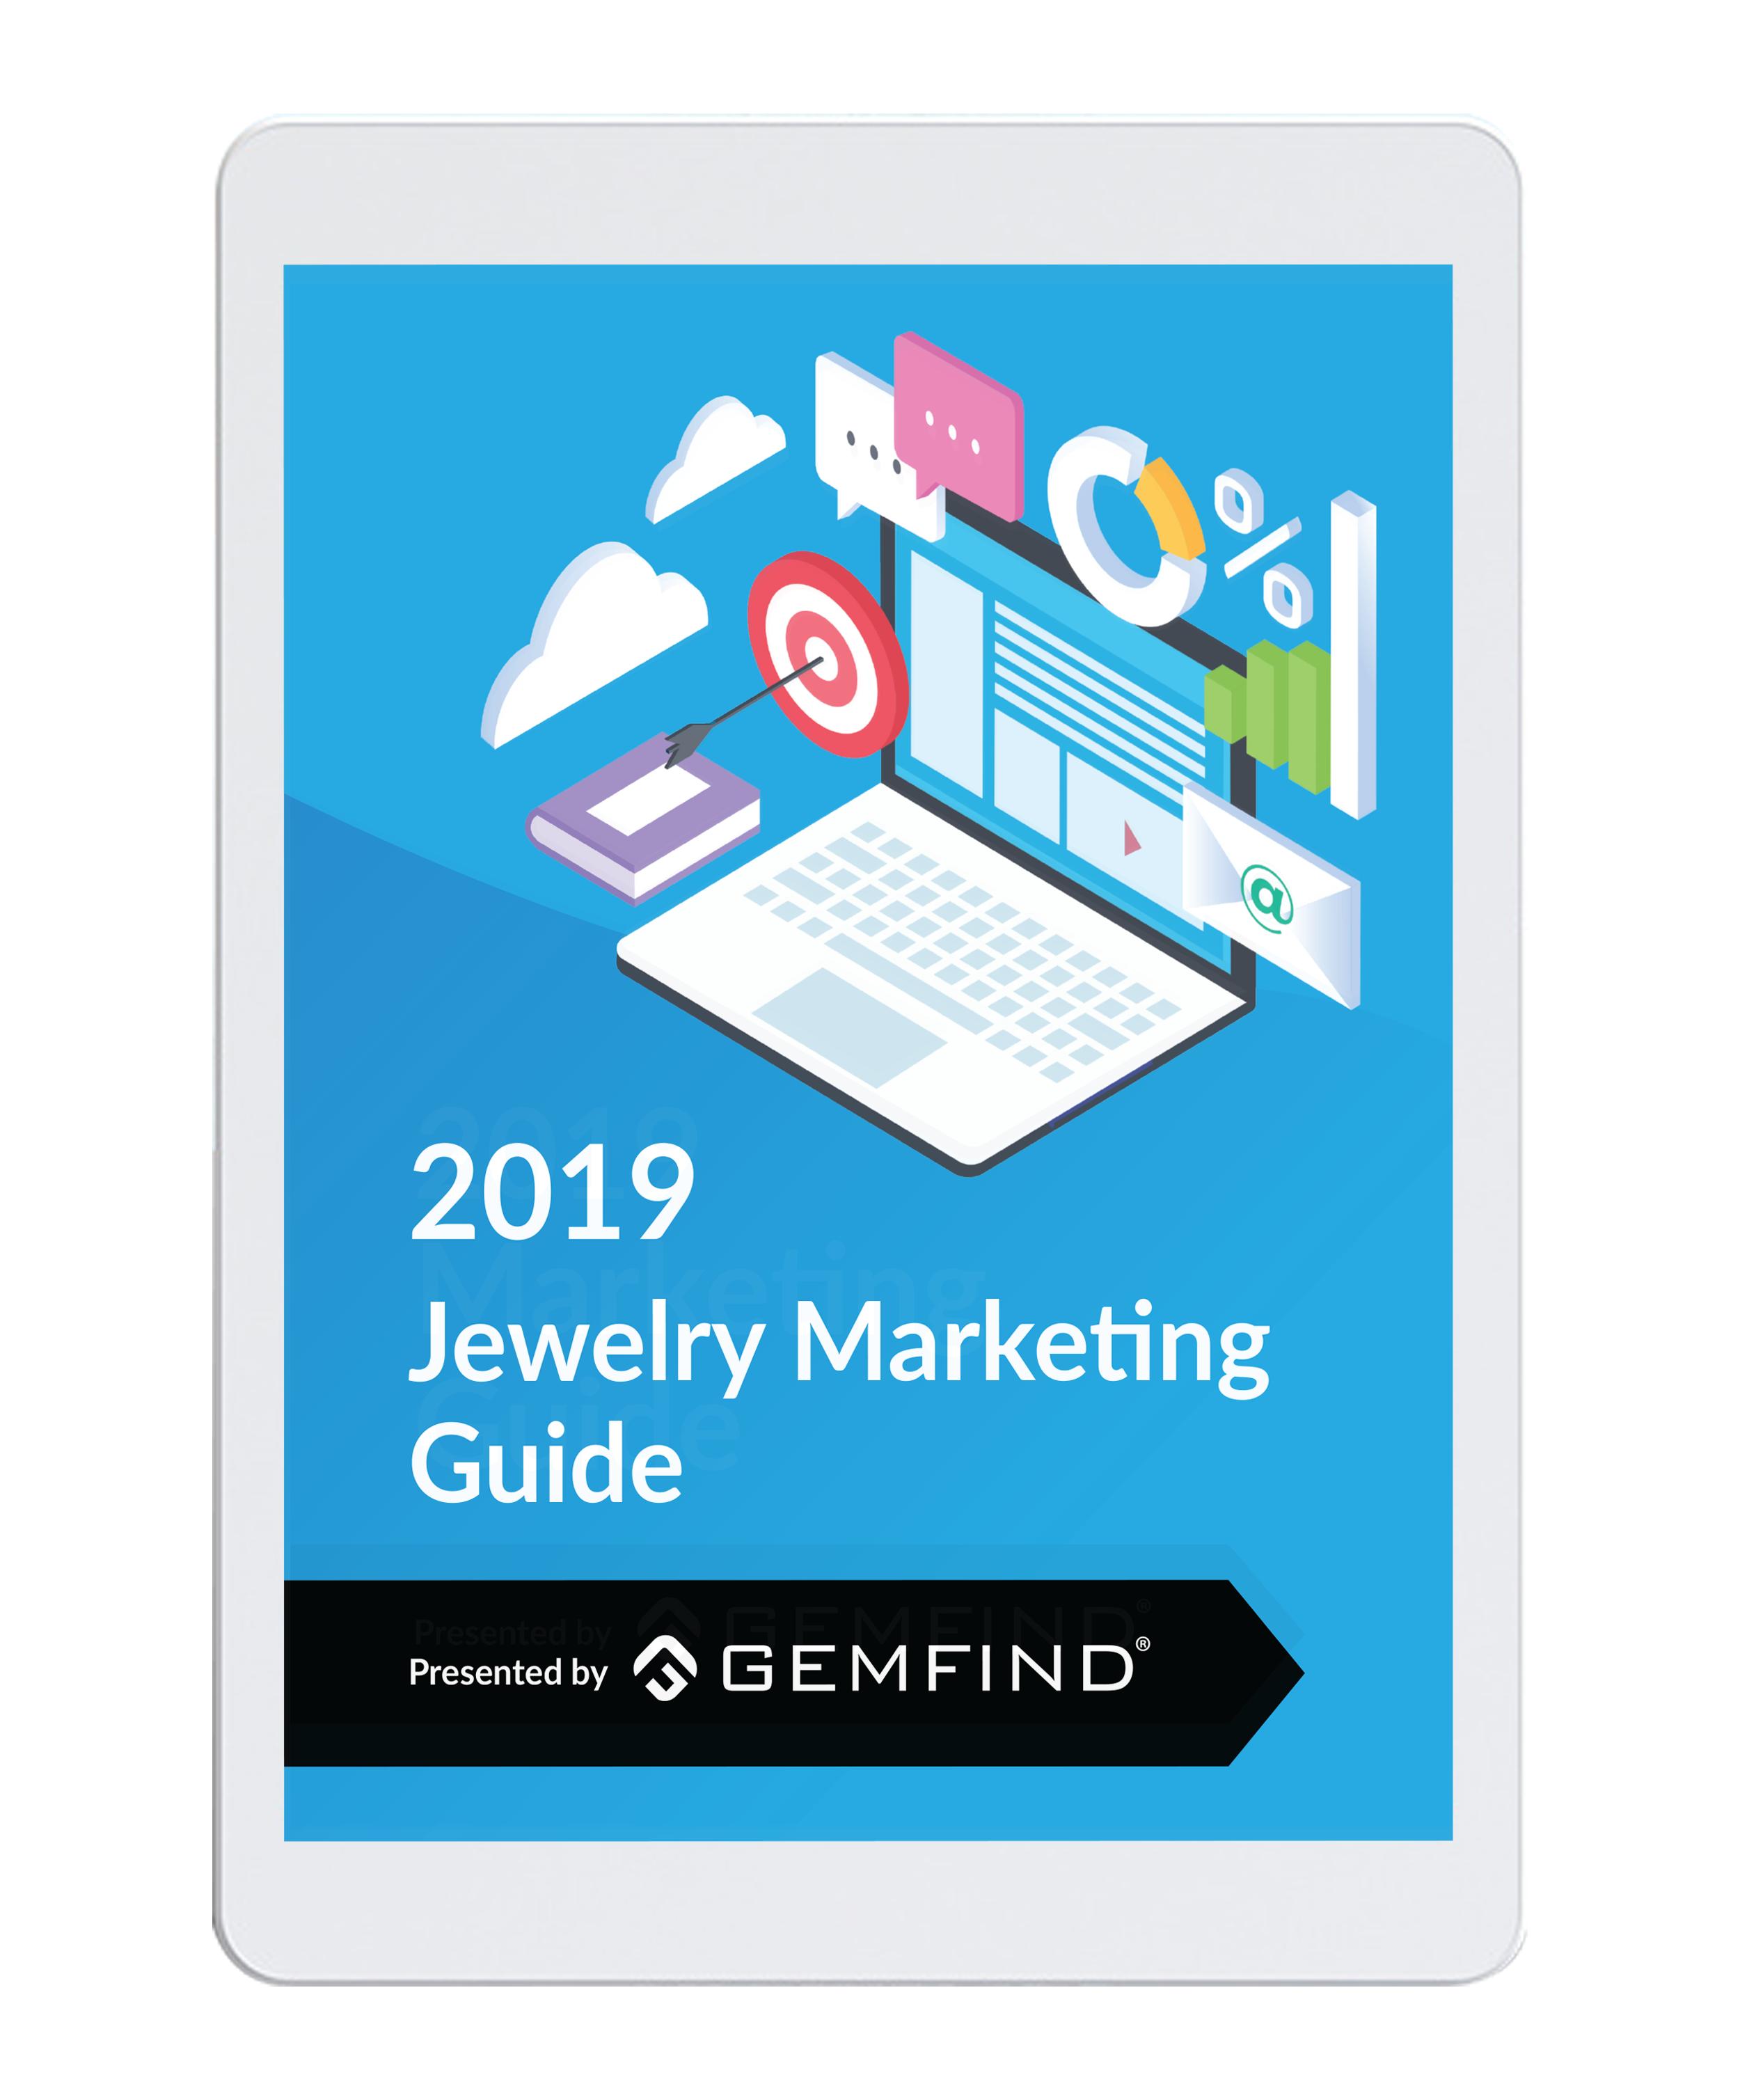 GF markt guide 2019v2